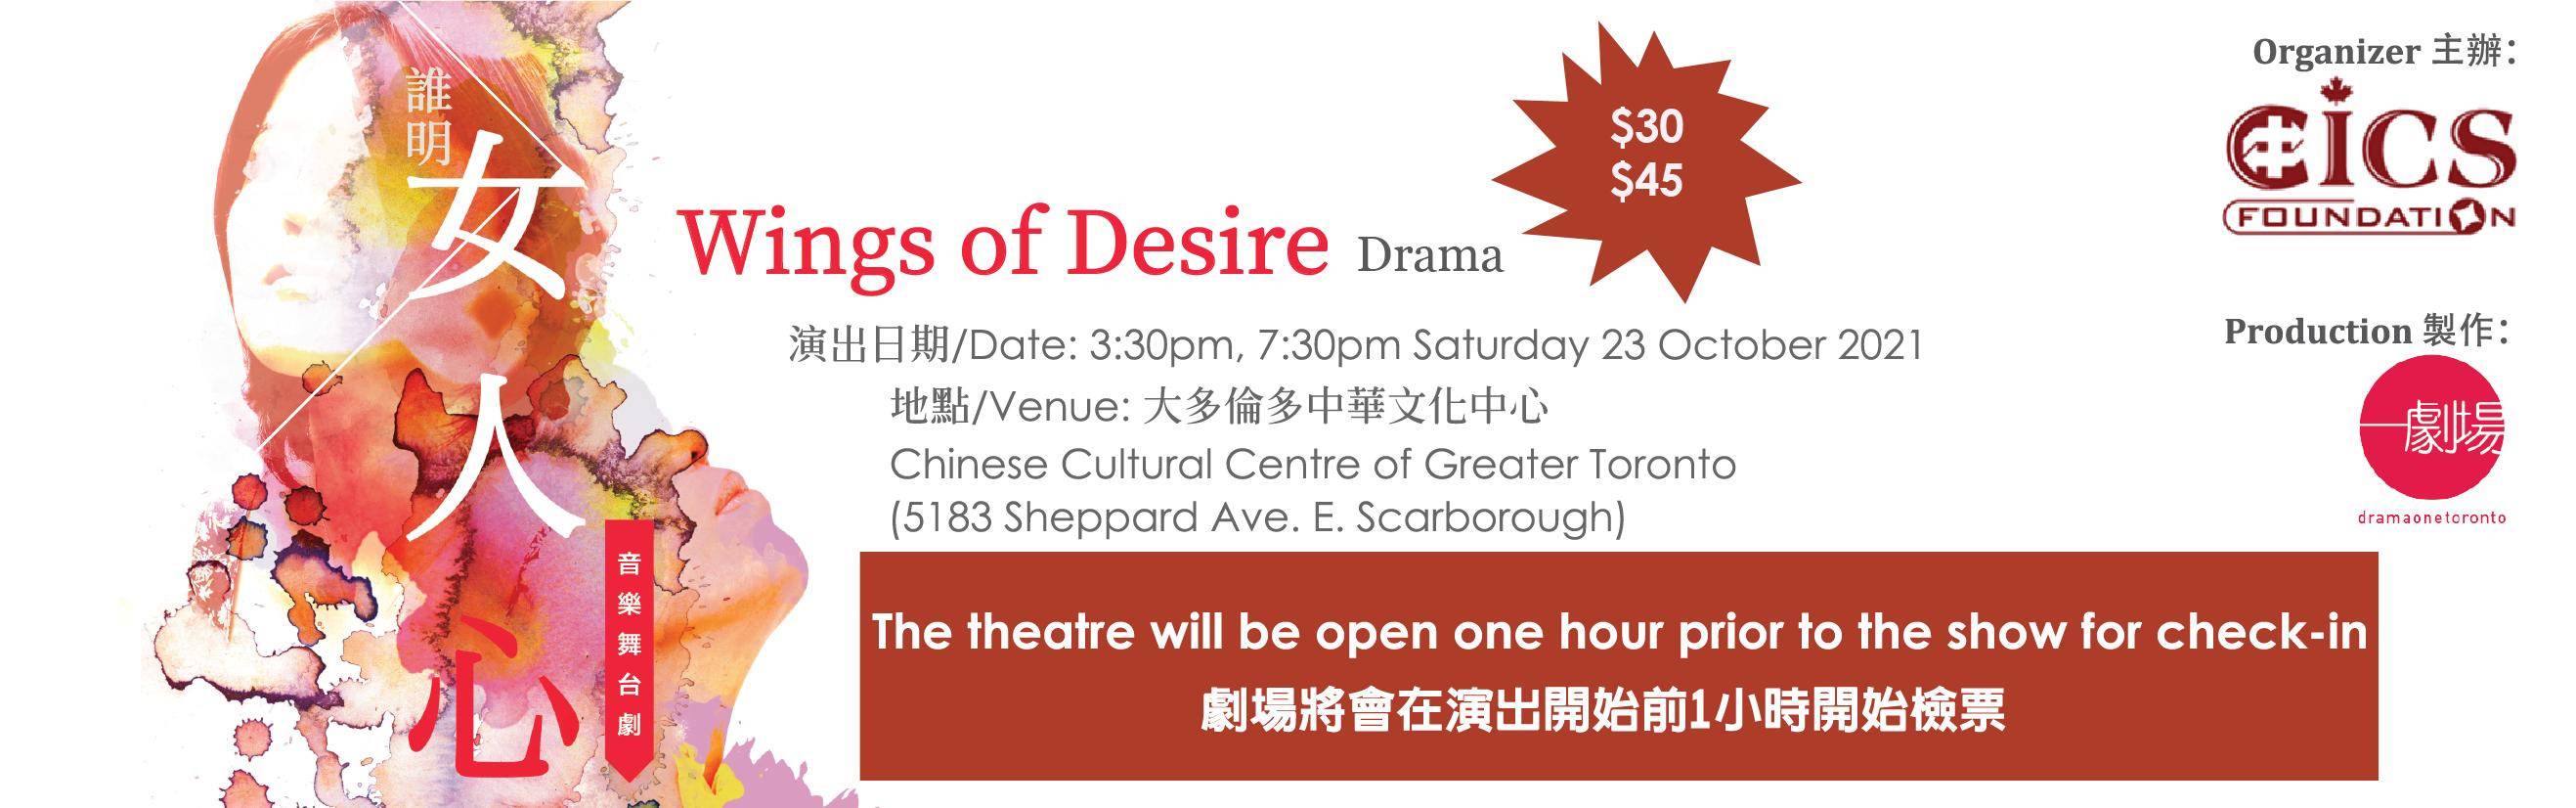 Wings of Desire Drama